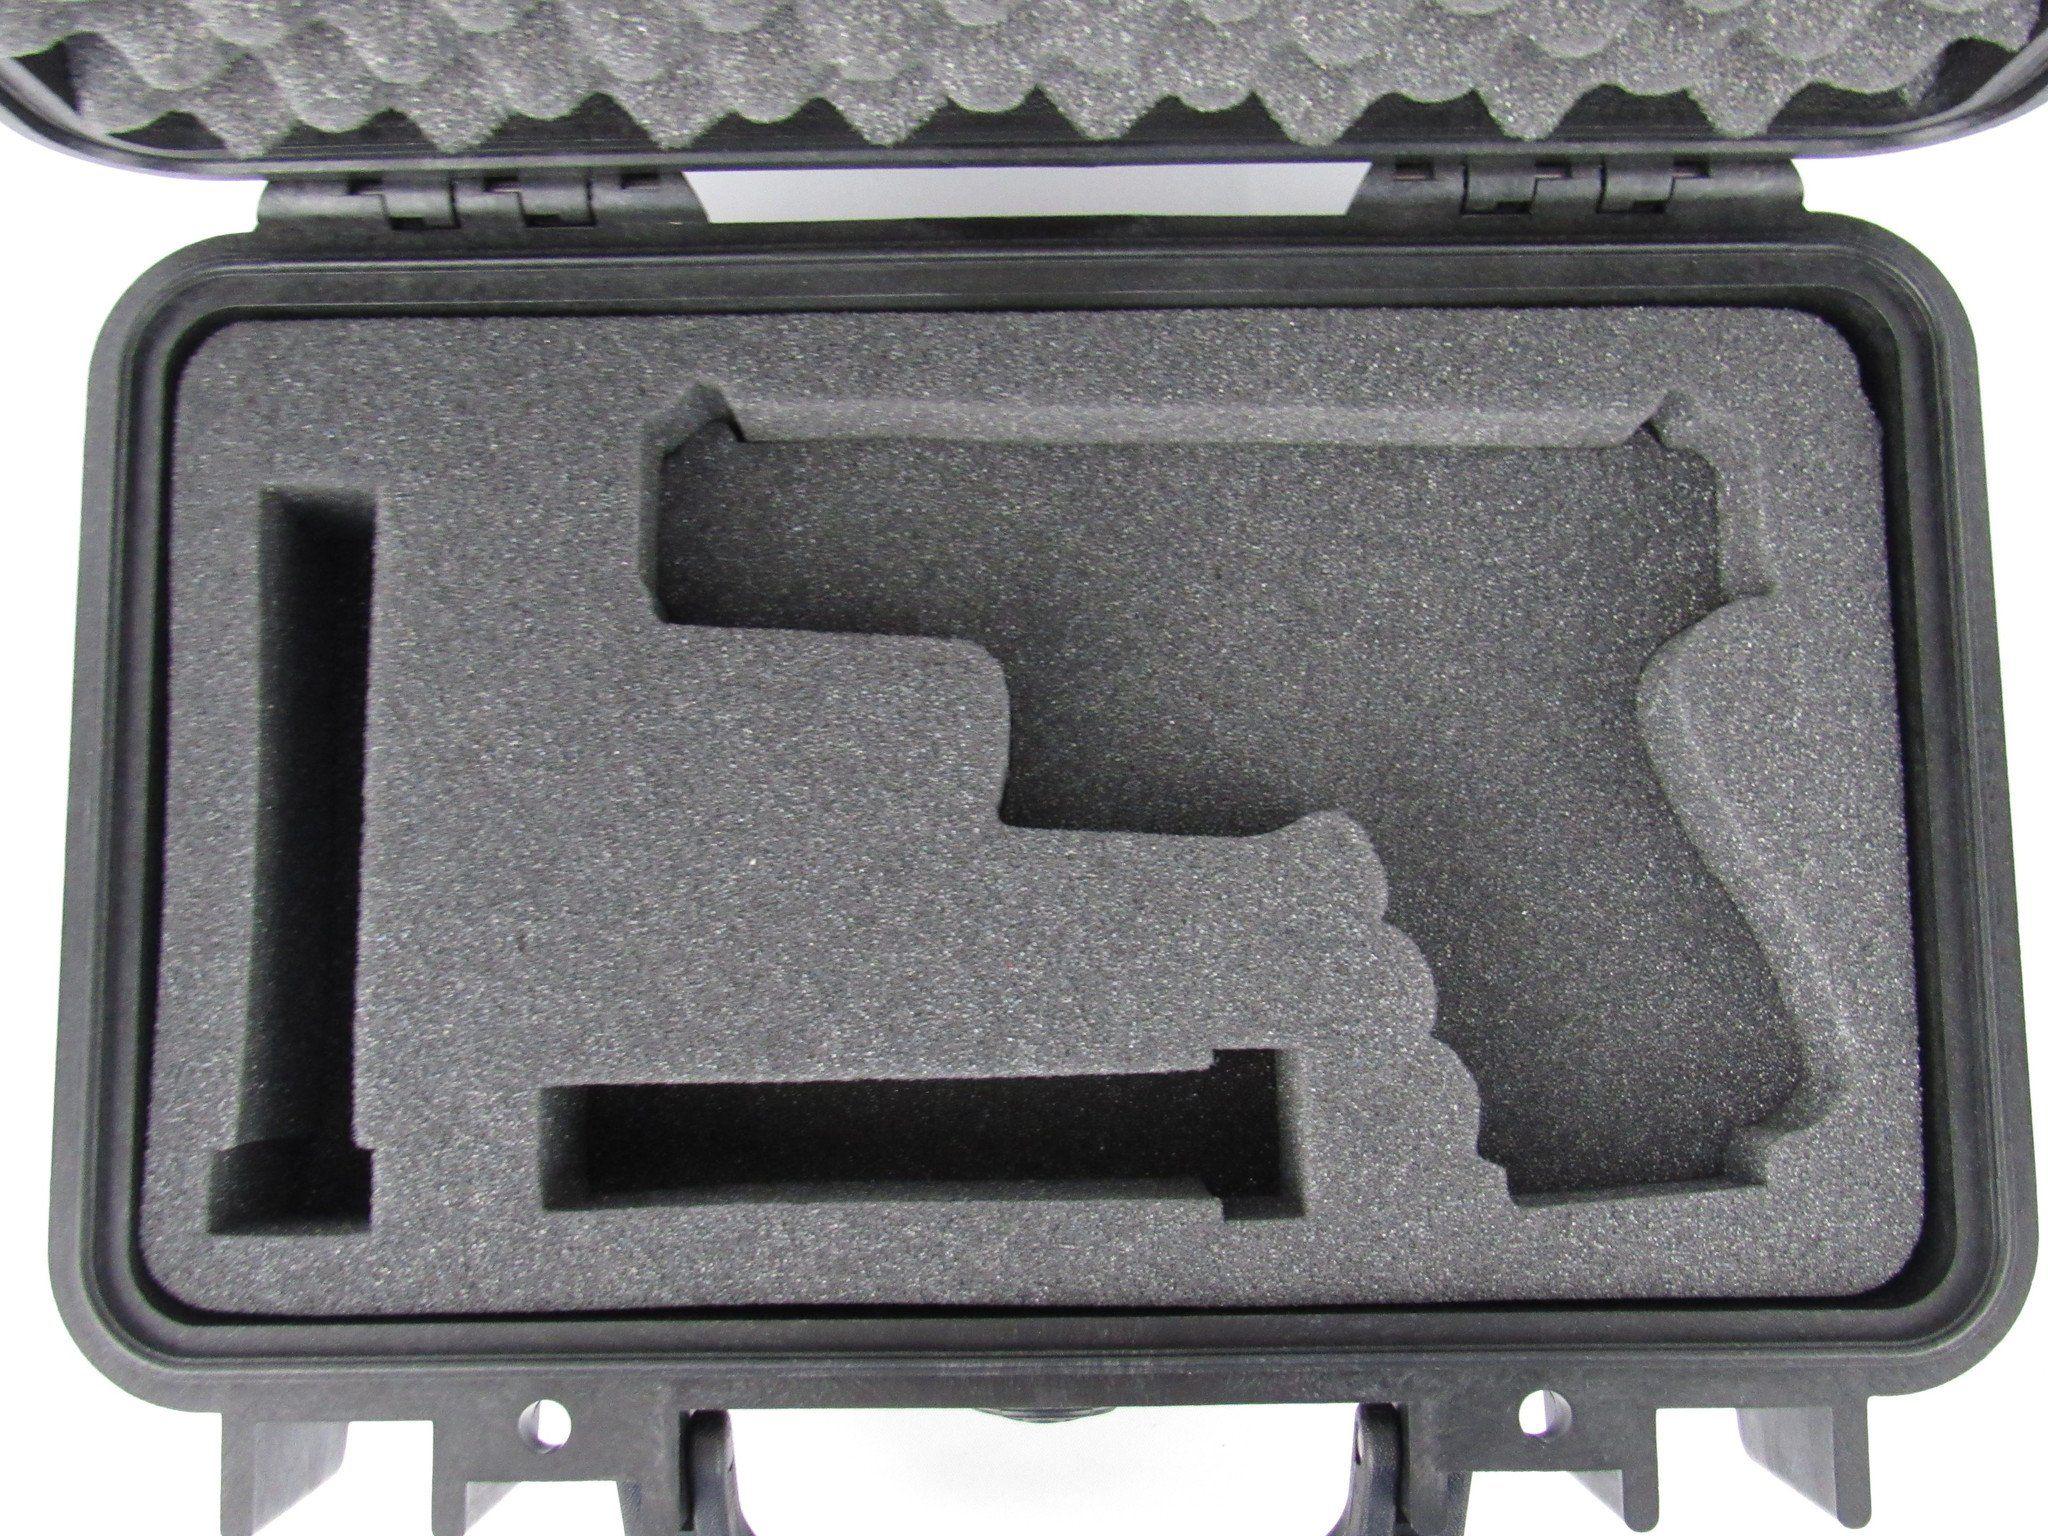 Pelican Case 1170 With Custom Insert for Glock 19 & Magazines ...